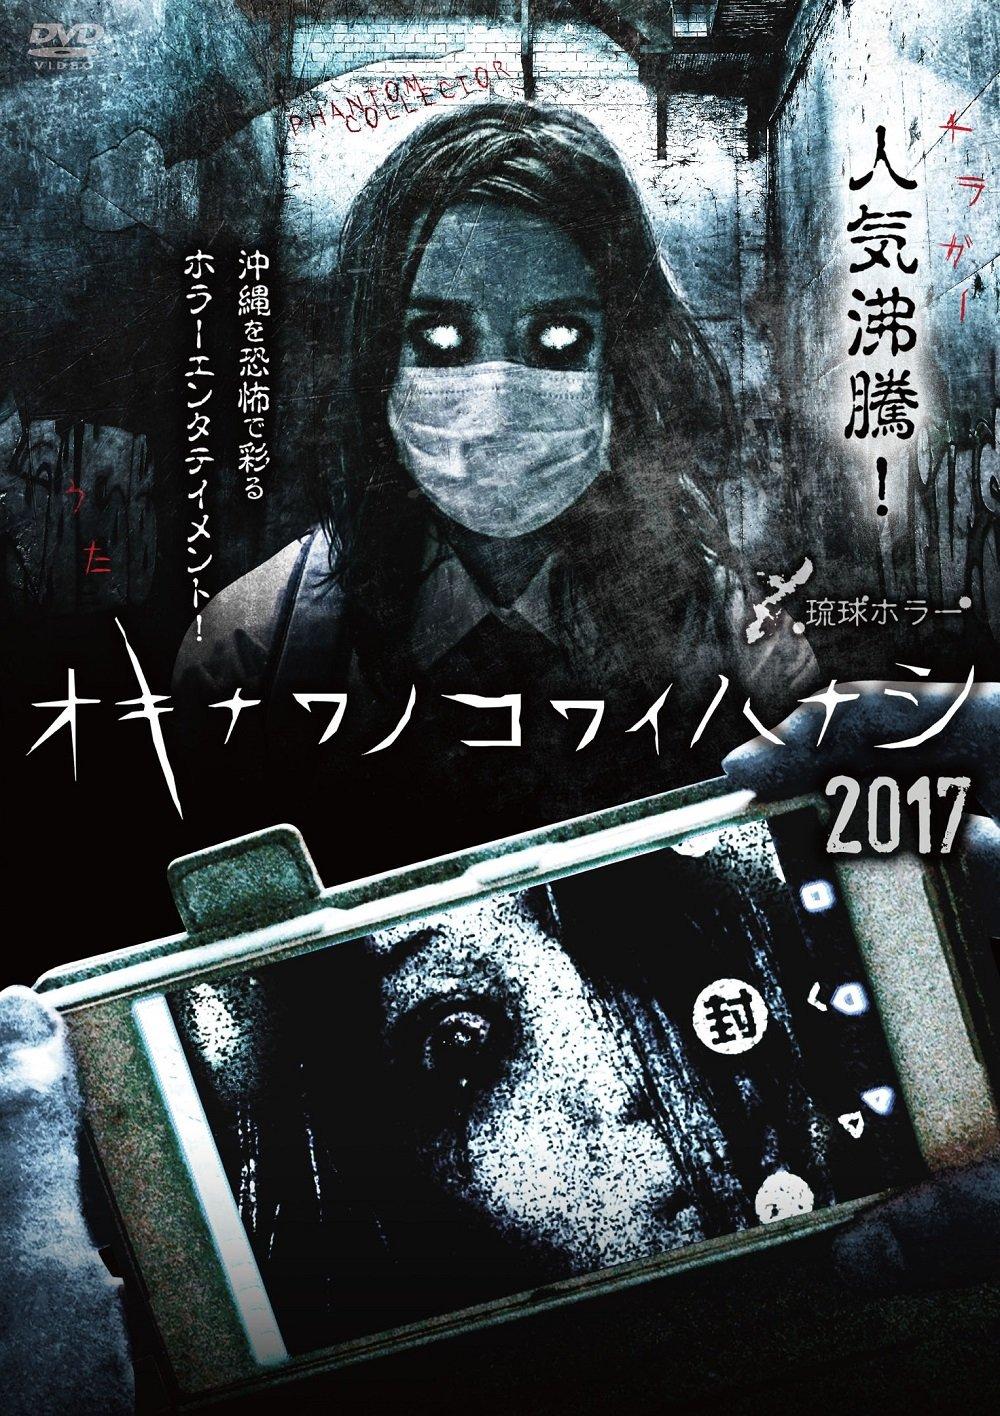 Amazon.com: JAPANESE TV DRAMA Ryukyu Horror Okinawa Hanakoi 2017 [DVD]  (JAPANESE AUDIO , NO ENGLISH SUB.): Movies & TV